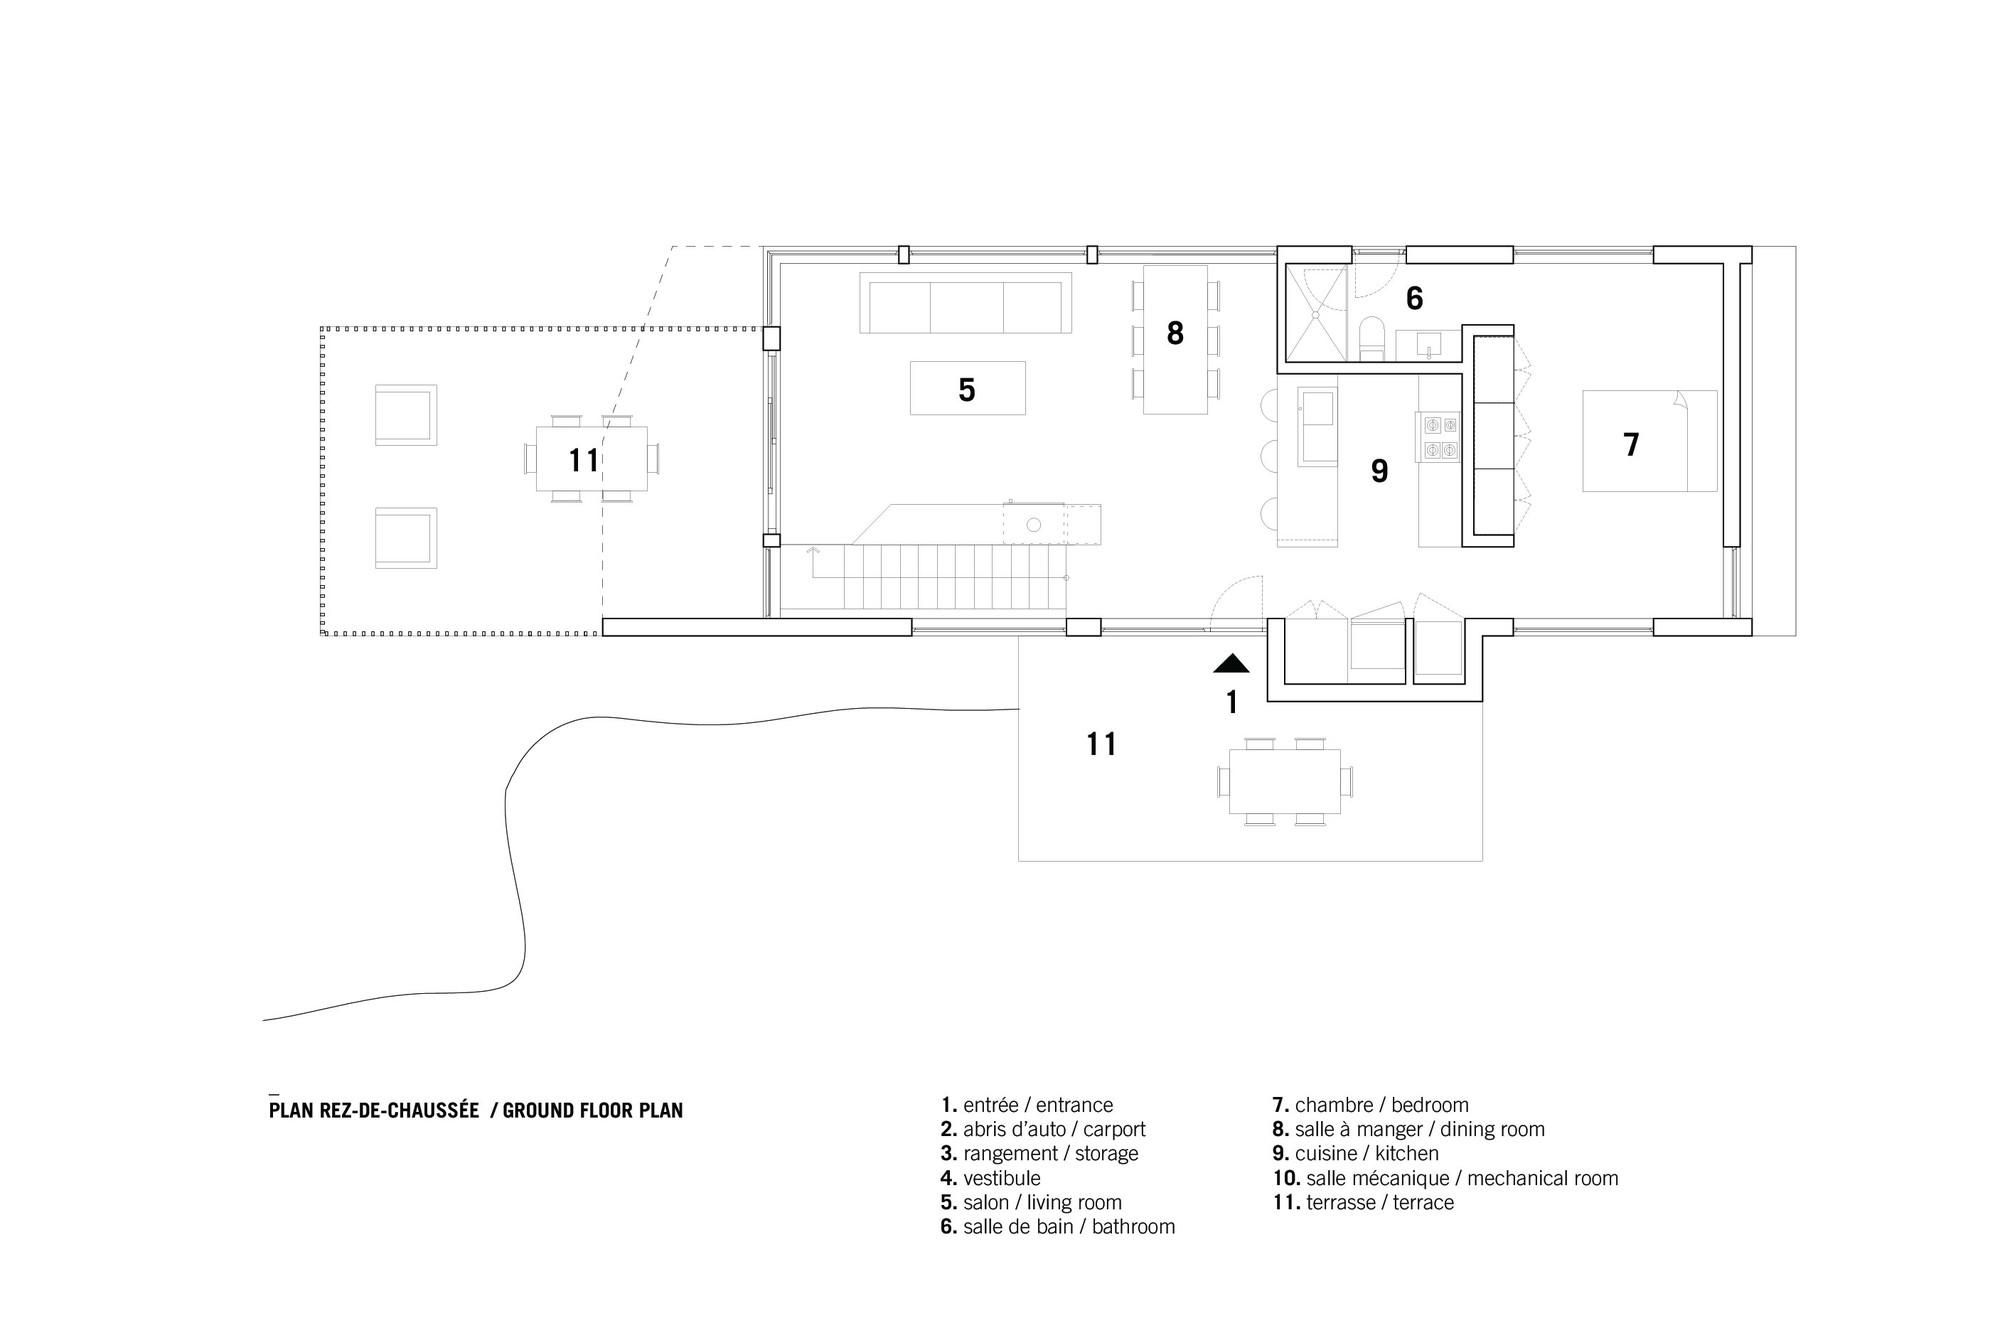 Bolton Residence,Ground Floor Plan